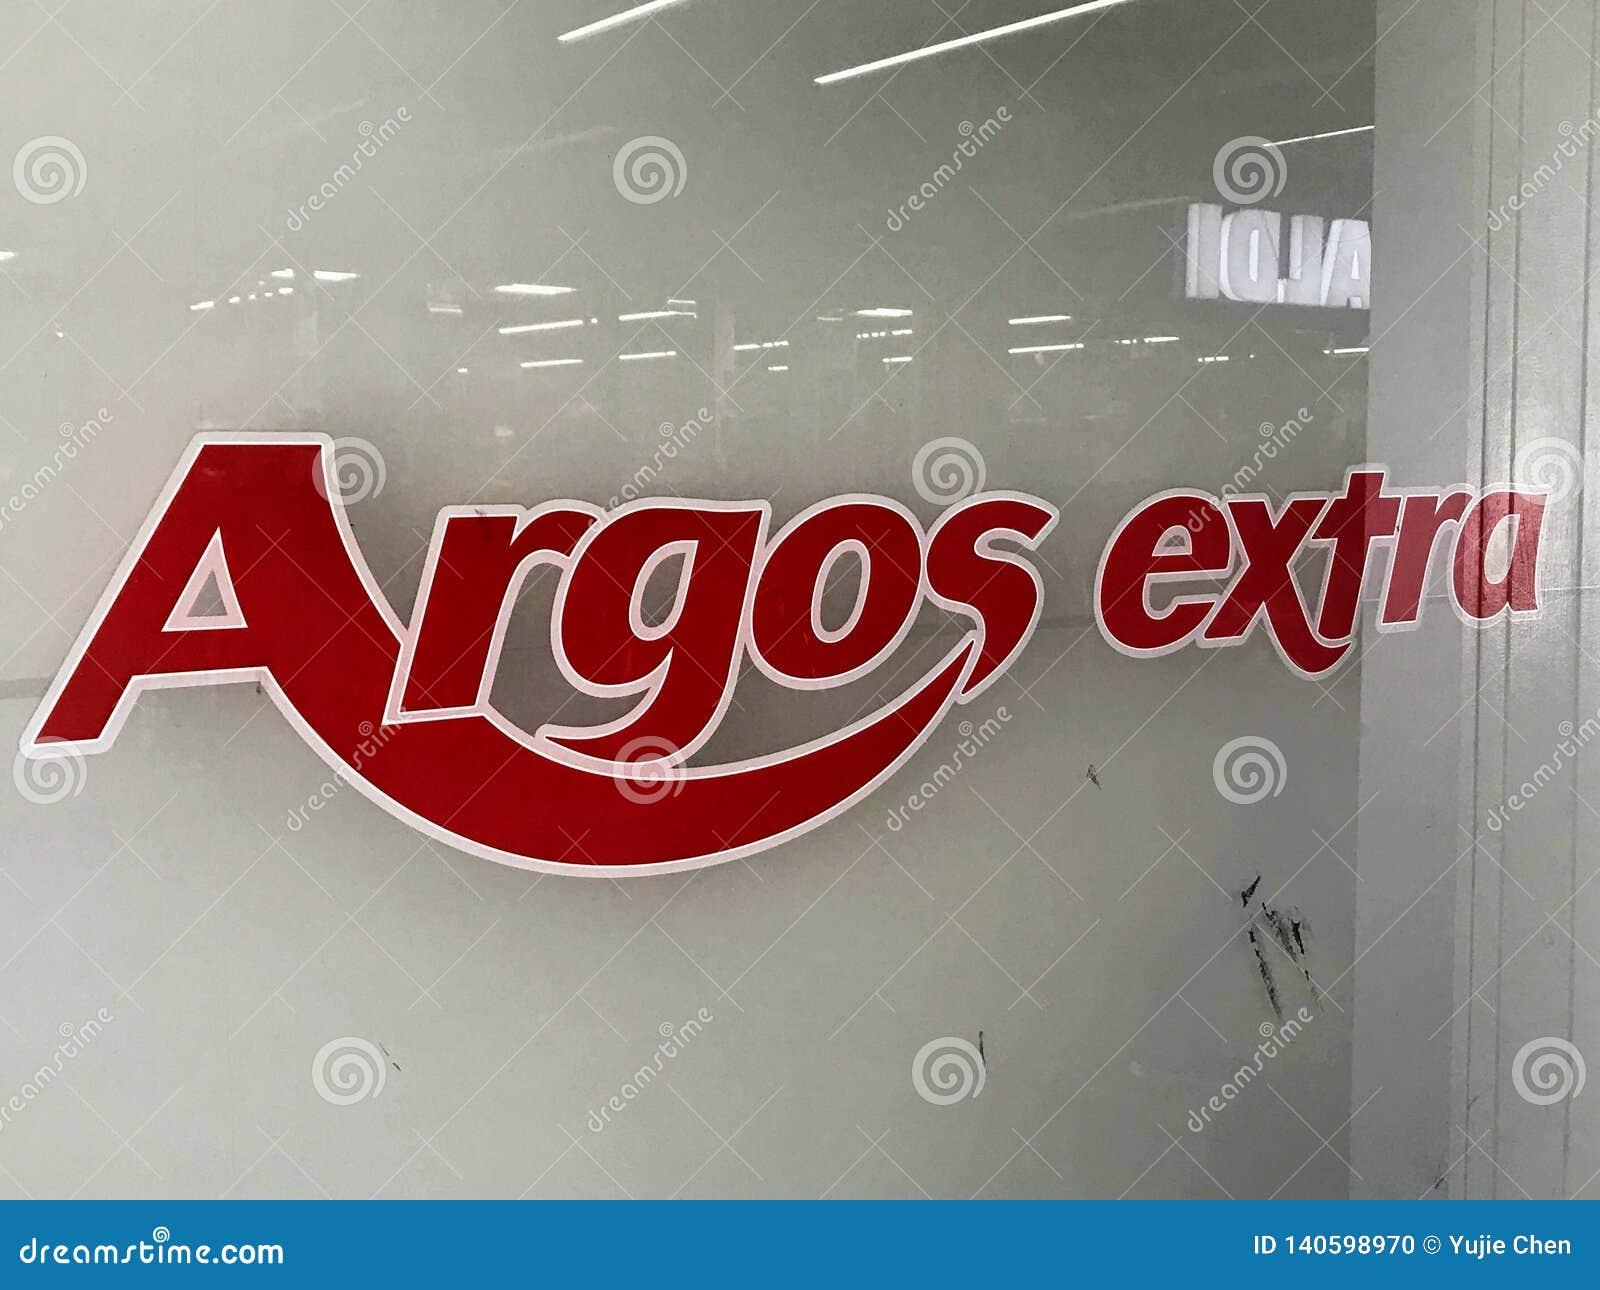 Argos extra store editorial image  Image of sainsburys - 140598970